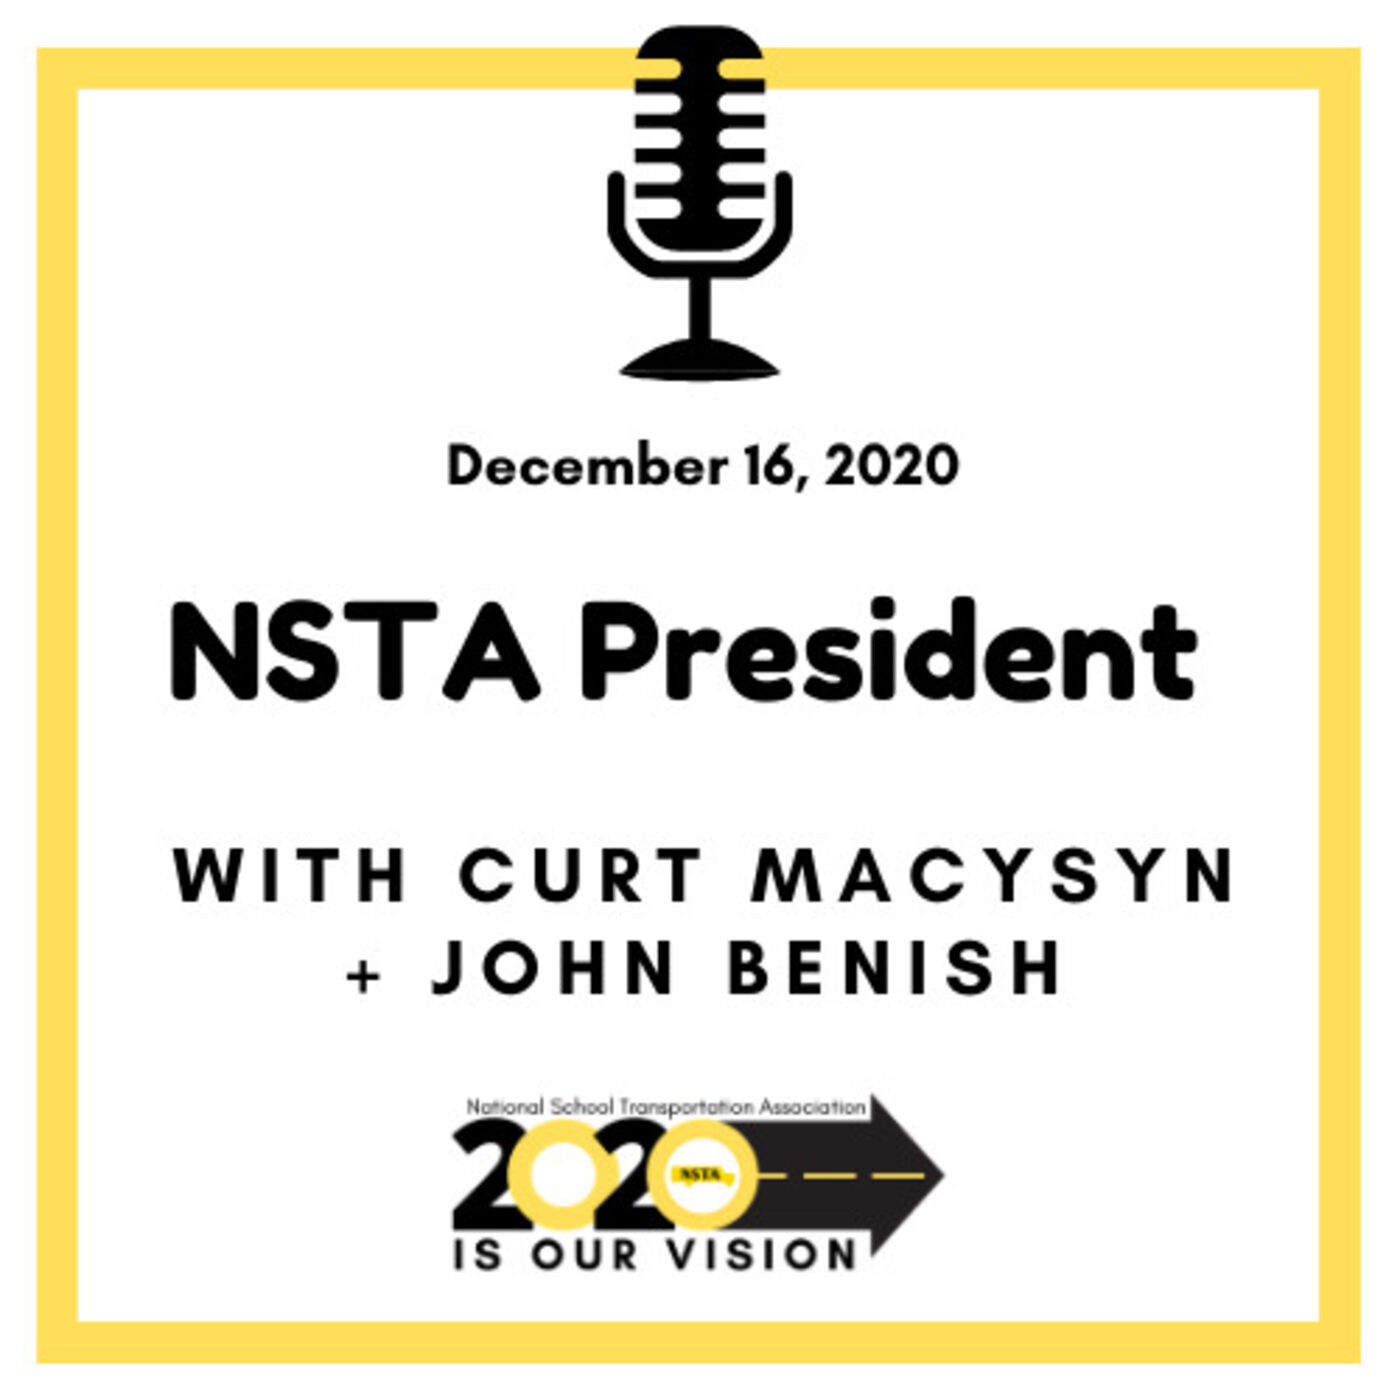 NSTA President | John Benish, COO of Cook Illinois